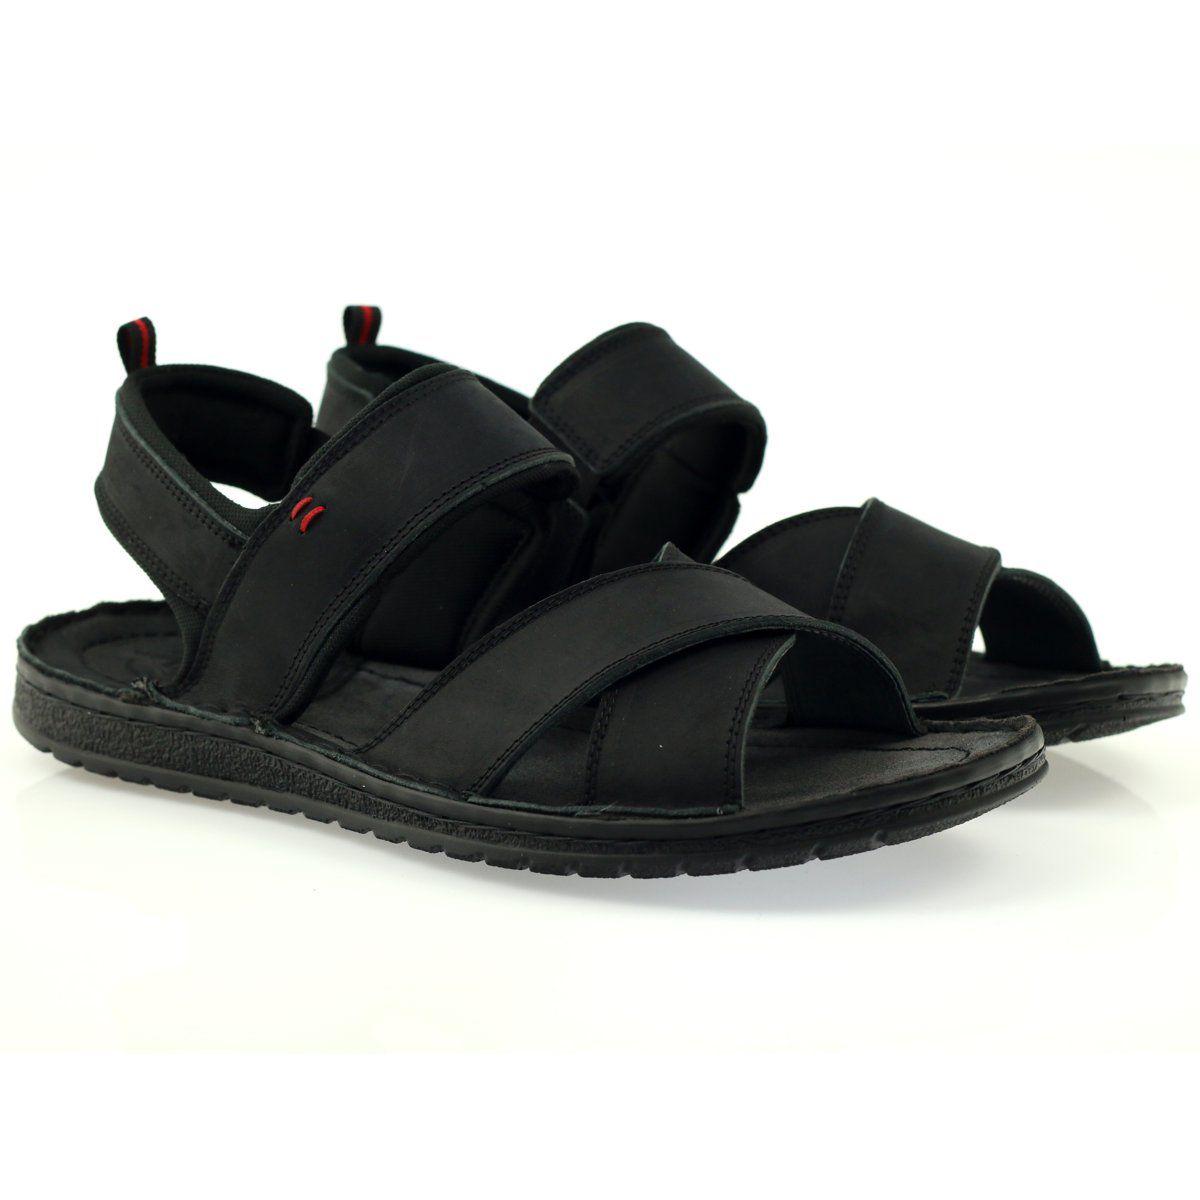 Sandaly Meskie Riko Sandaly Sportowe Riko 852 Czarne Sneakers Men Fashion Sneakers Men Mens Sandals